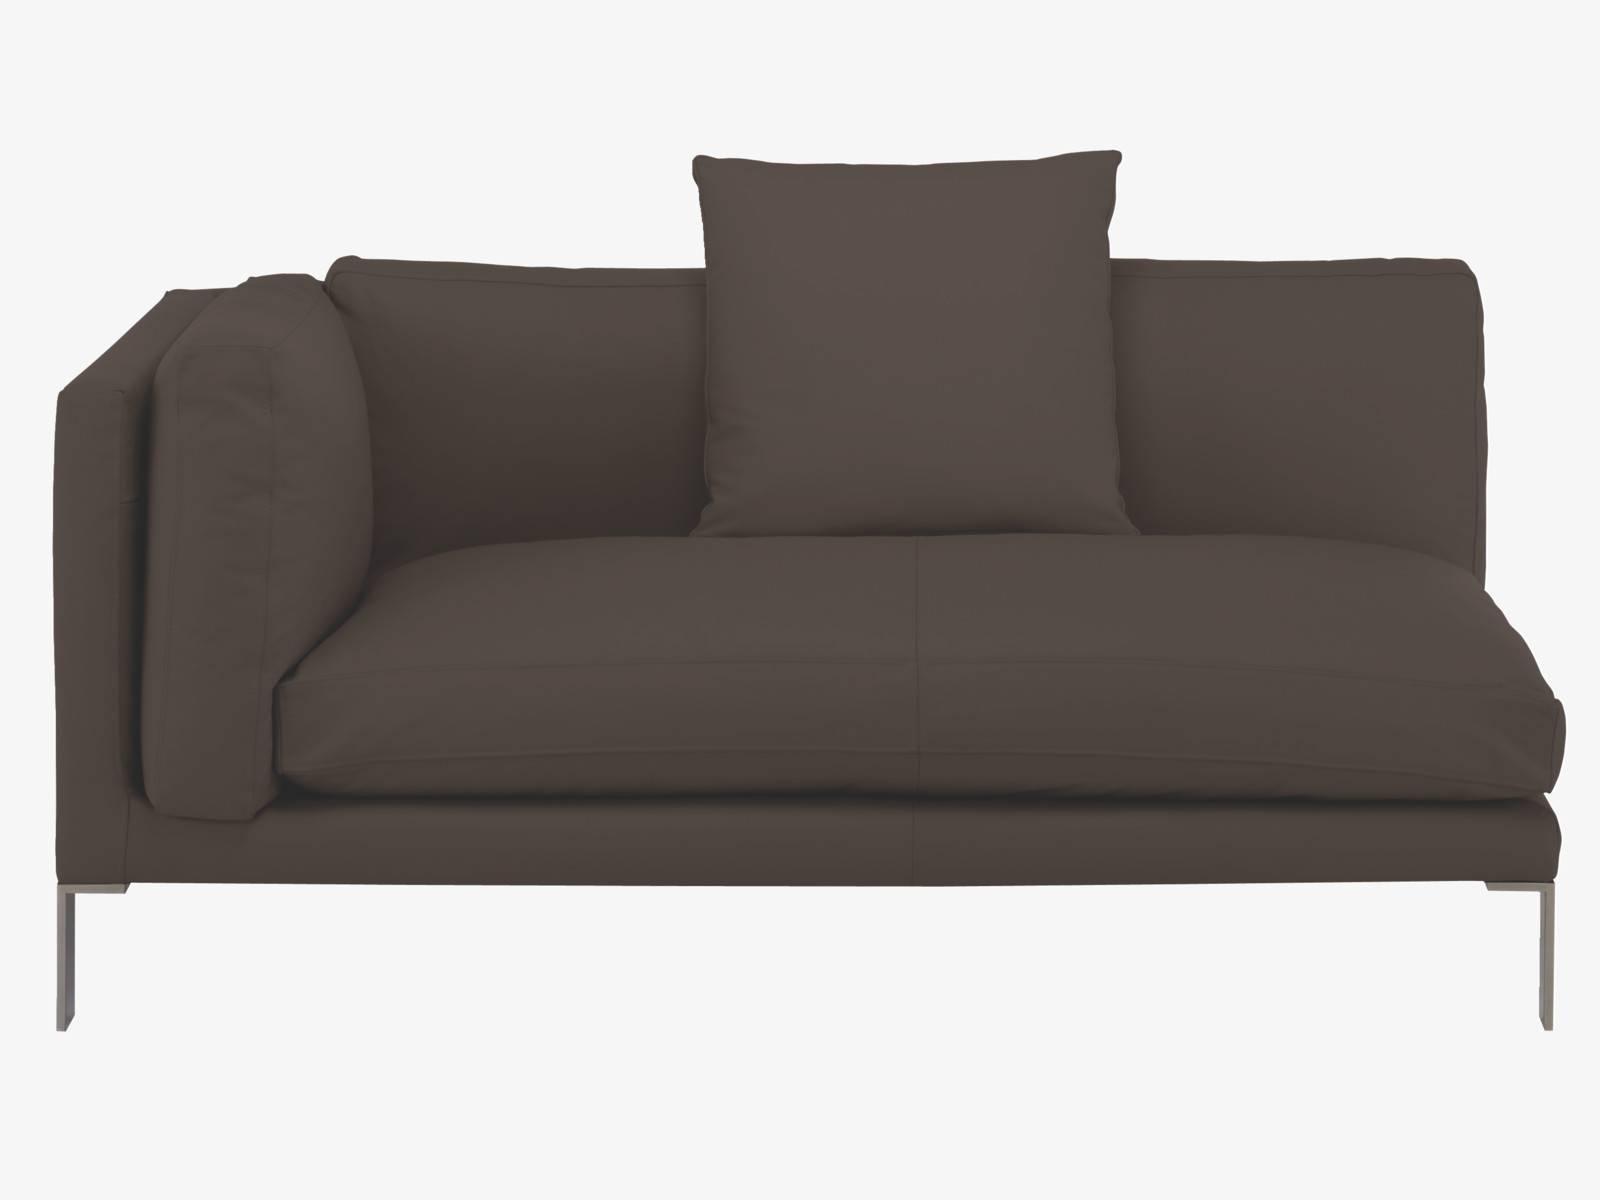 small modular sectional sofas queen sofa sleeper 25 the best